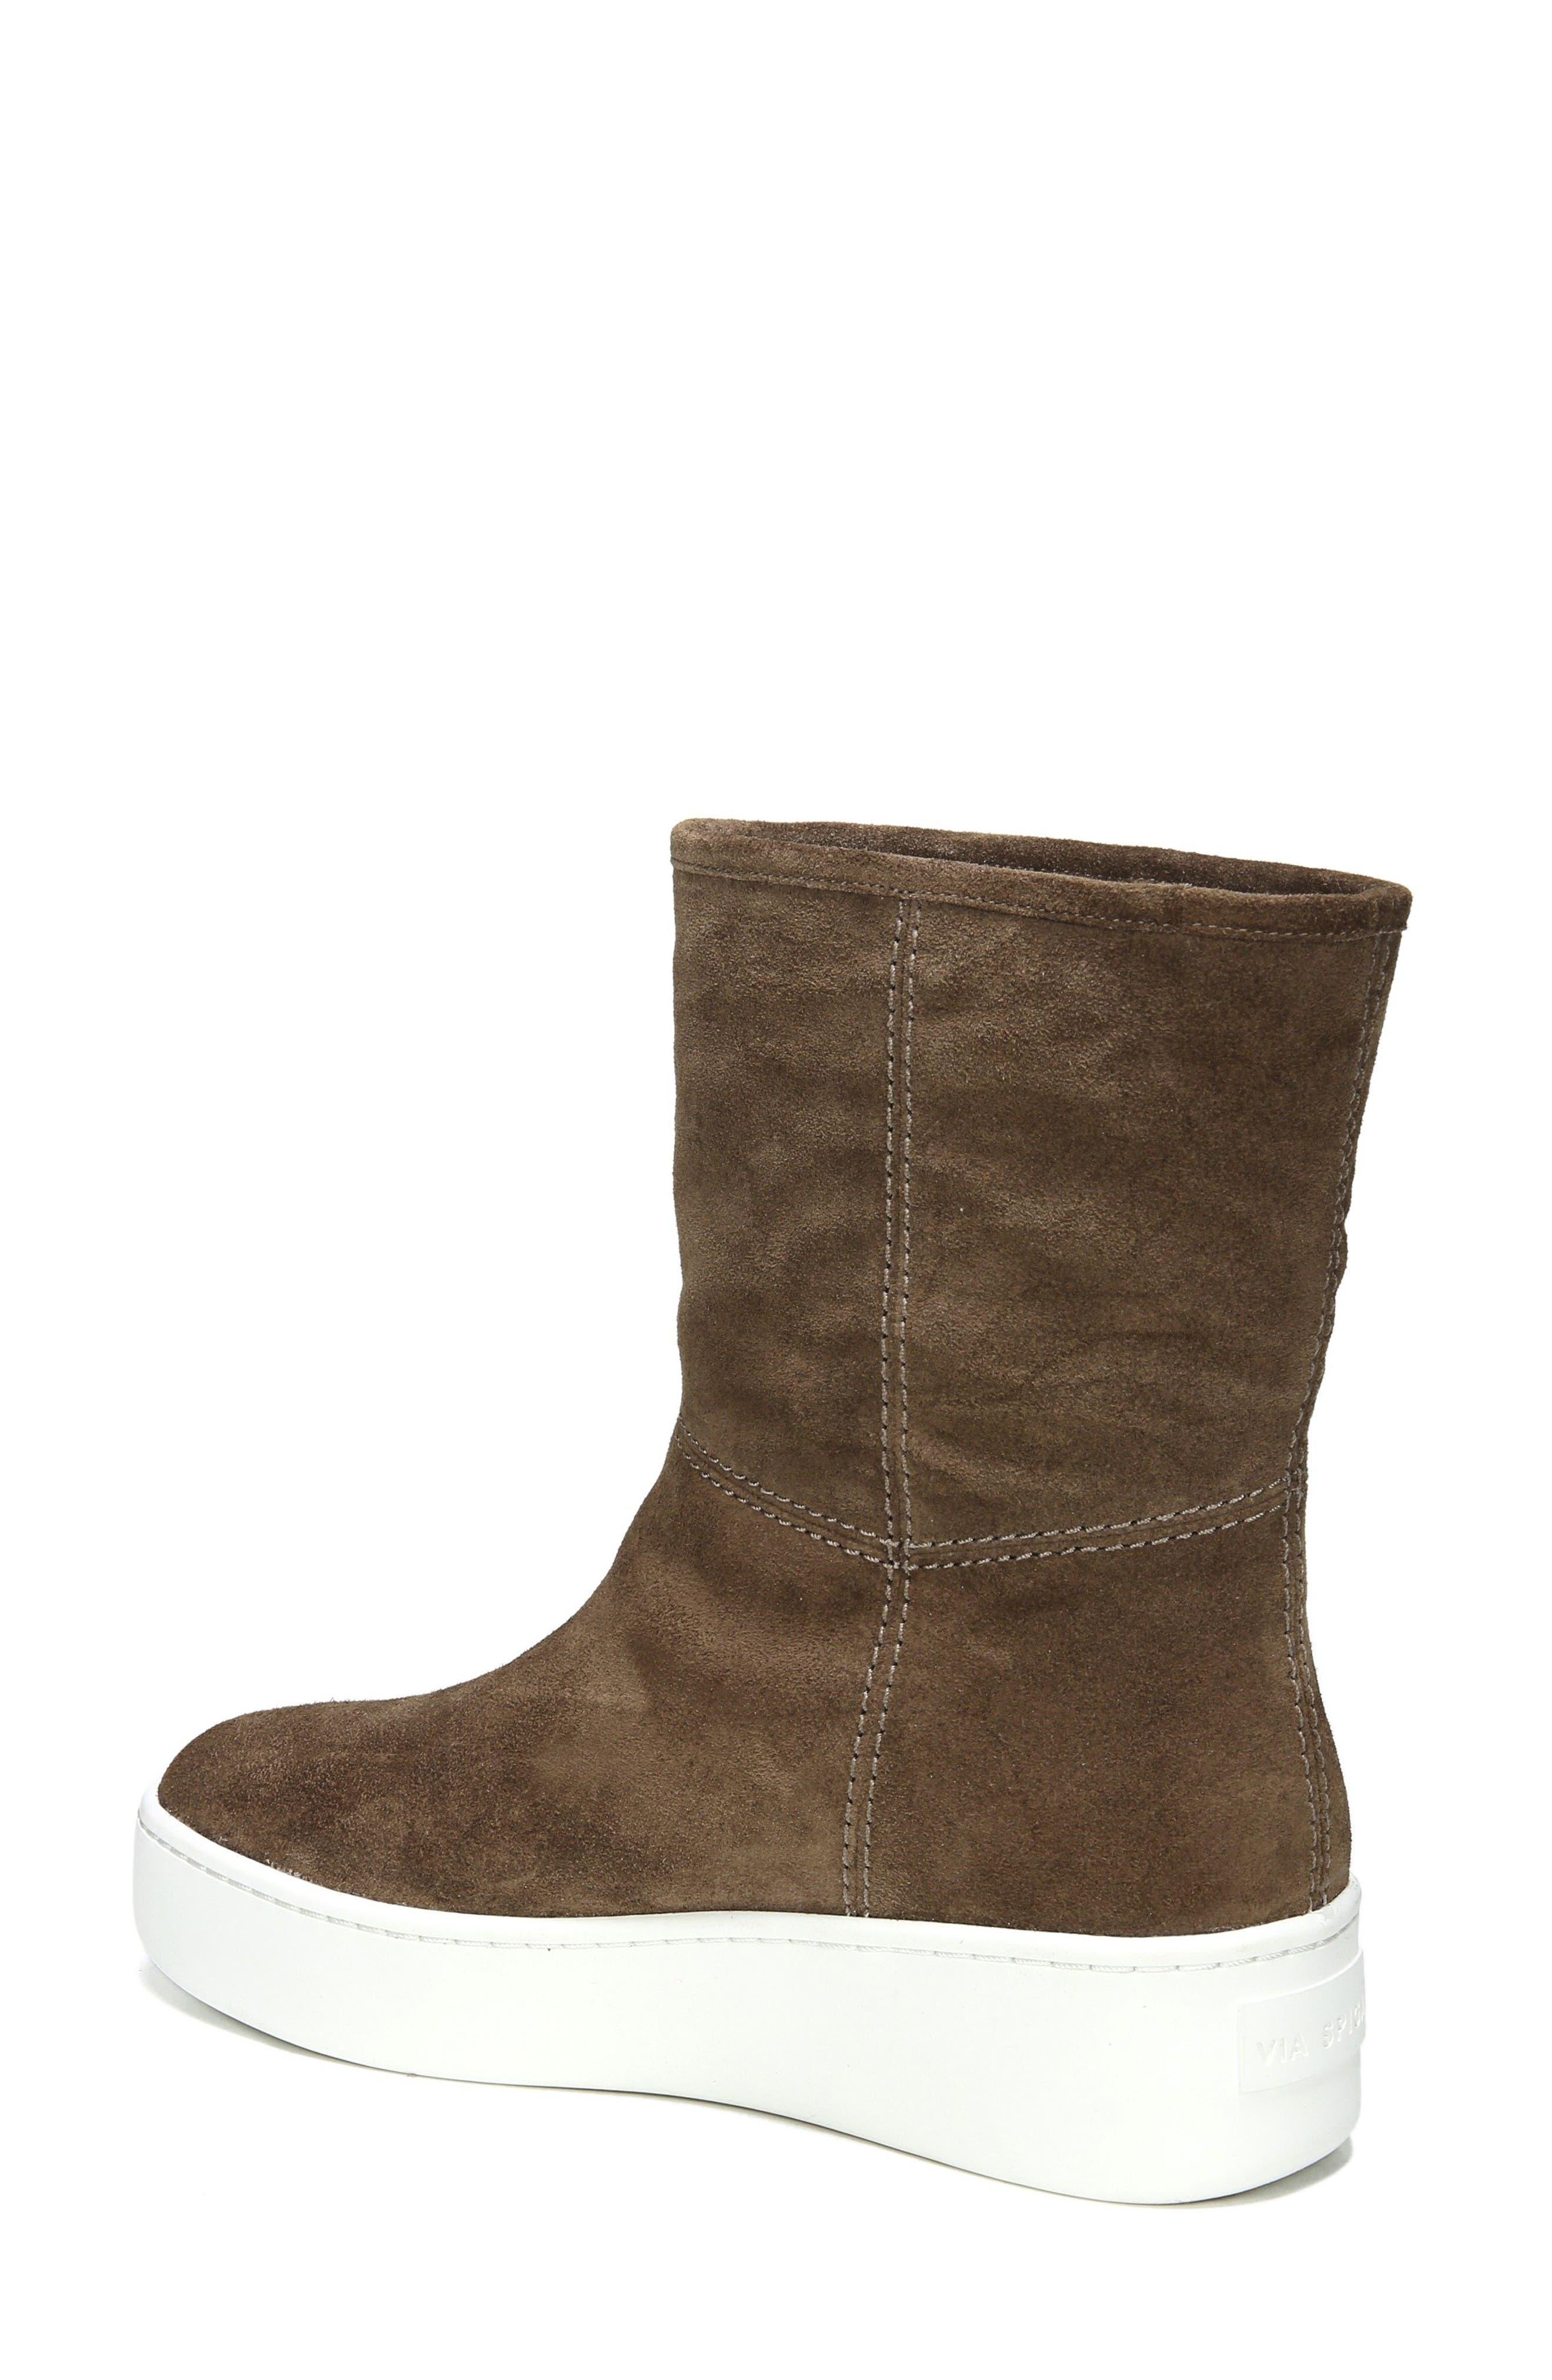 Alternate Image 2  - Via Spiga Elona Genuine Shearling Lined Sneaker Boot (Women)